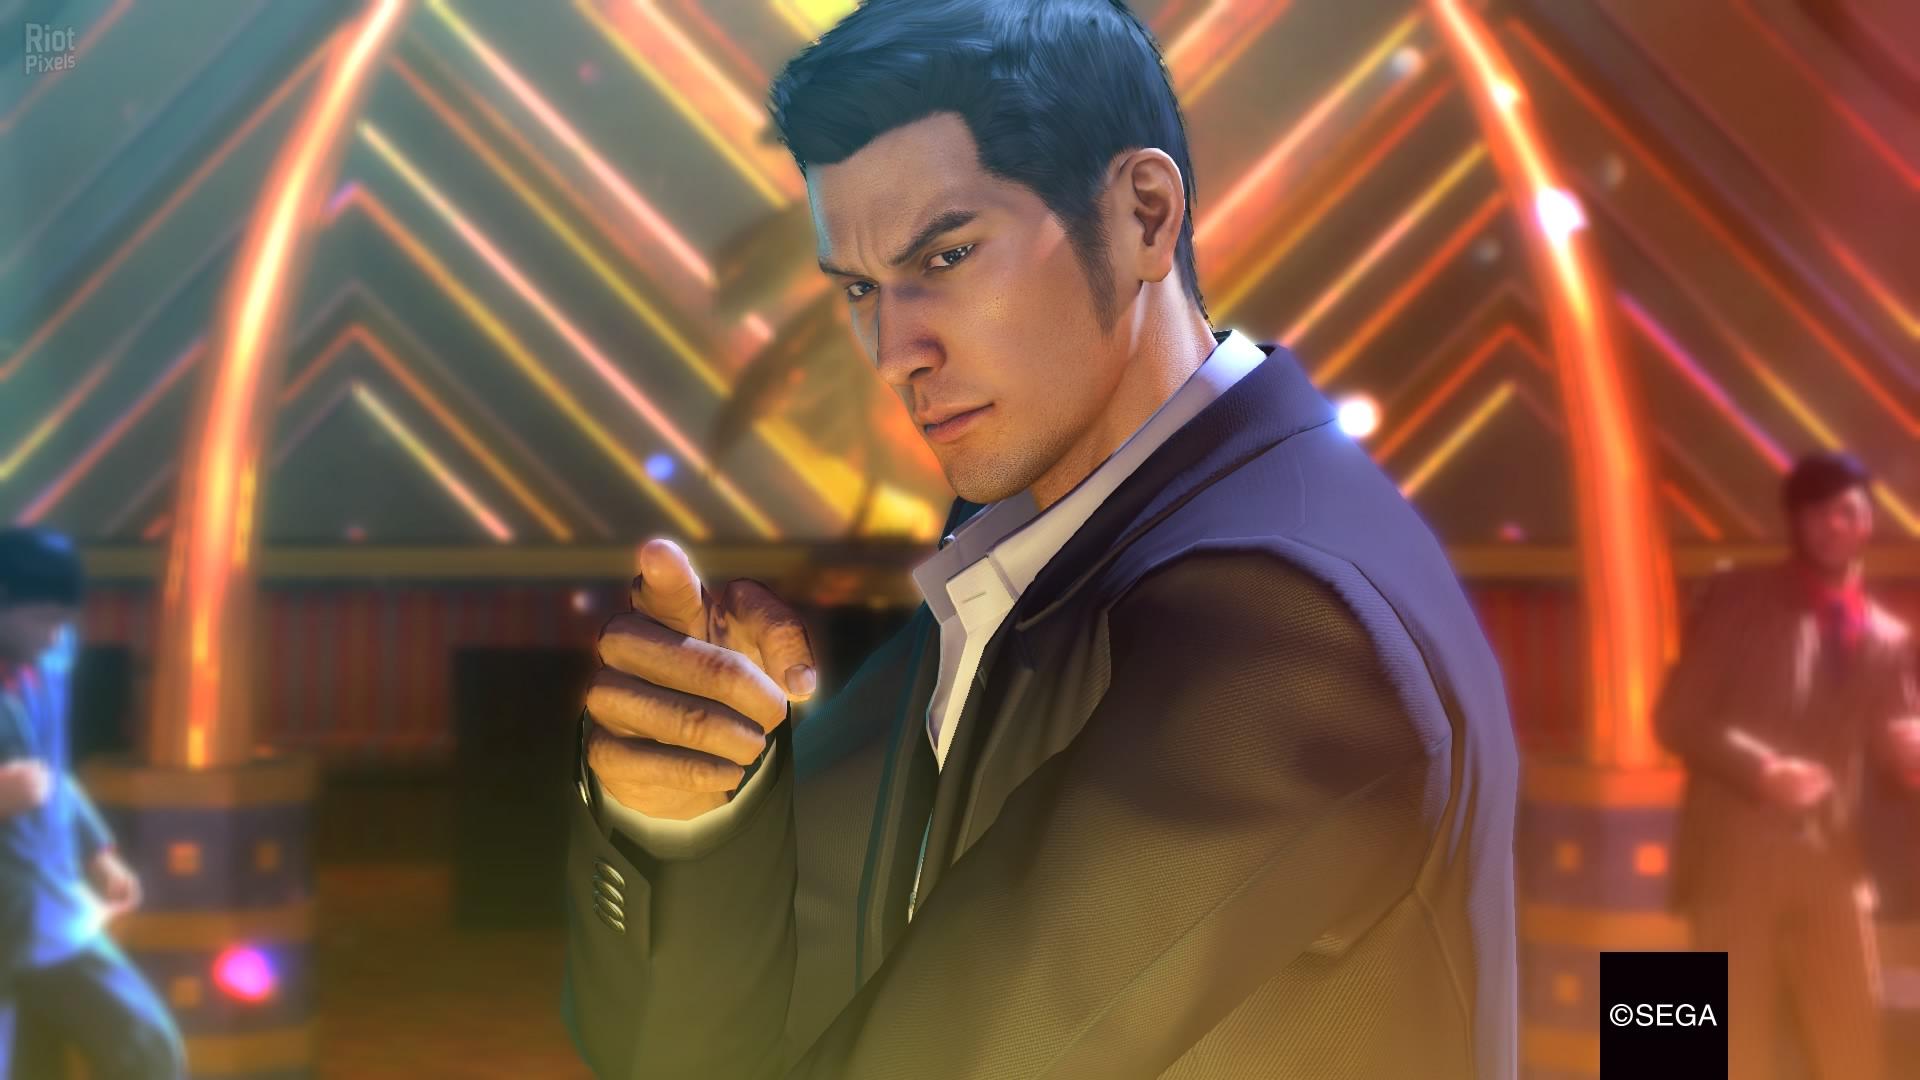 Yakuza 0 Game Screenshots At Riot Pixels Images